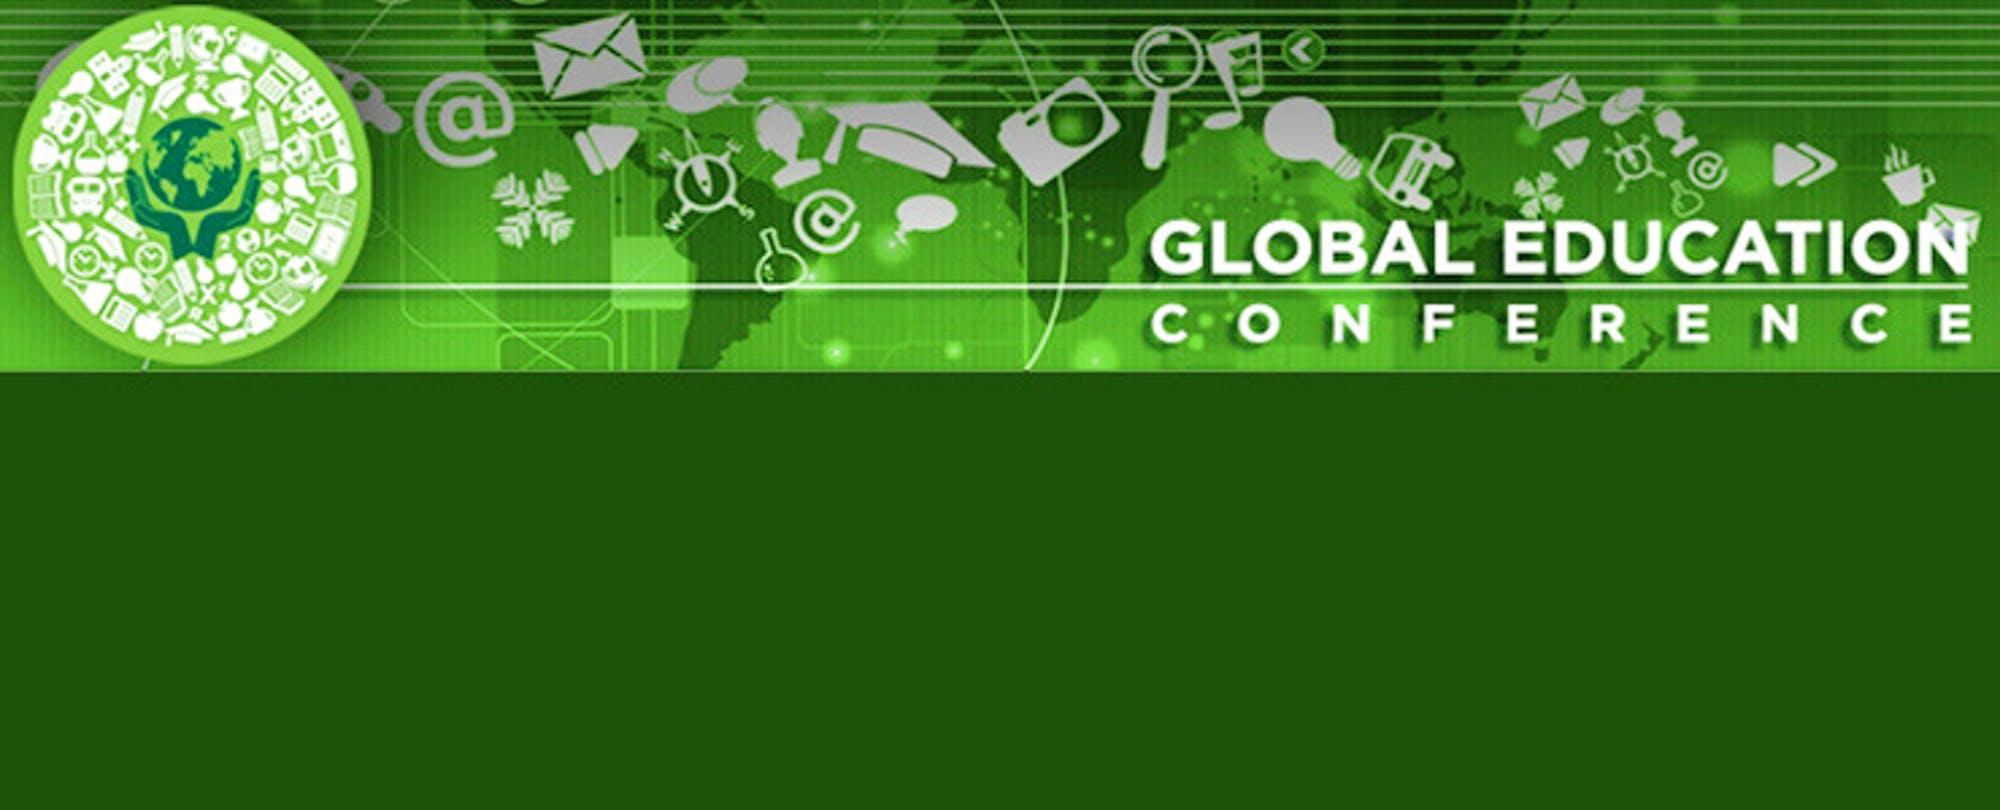 Global Education Conference a Virtual Edu-Extravaganza